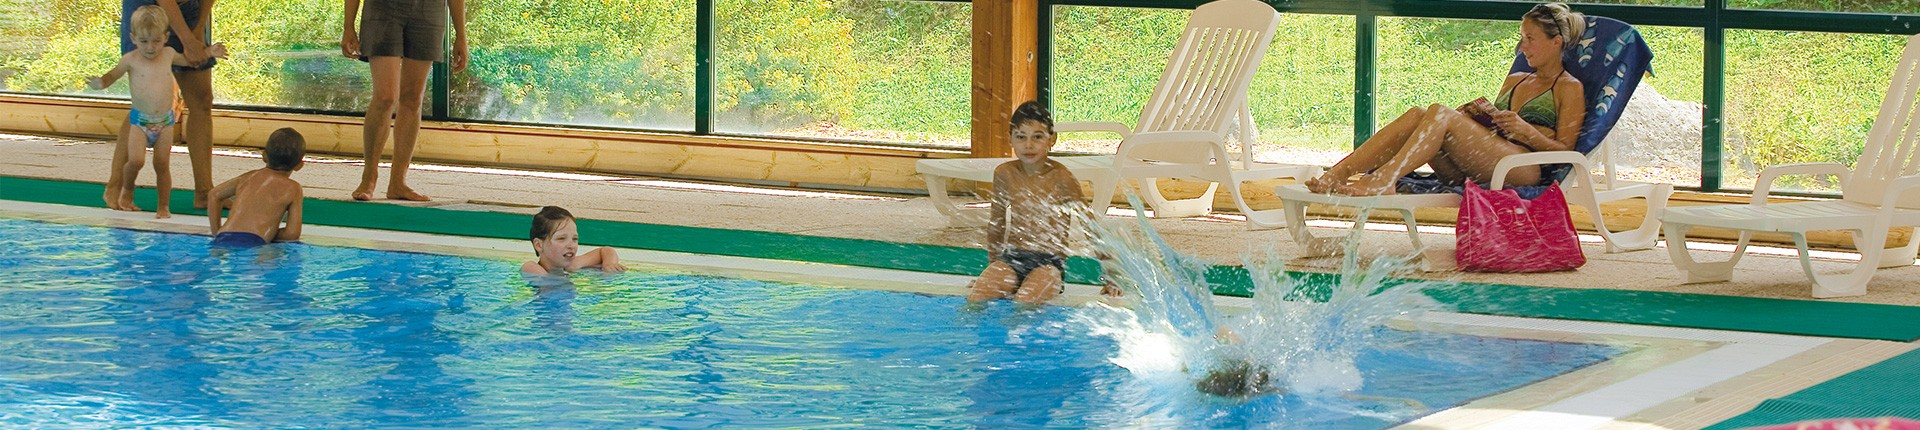 tetiere-piscine-11